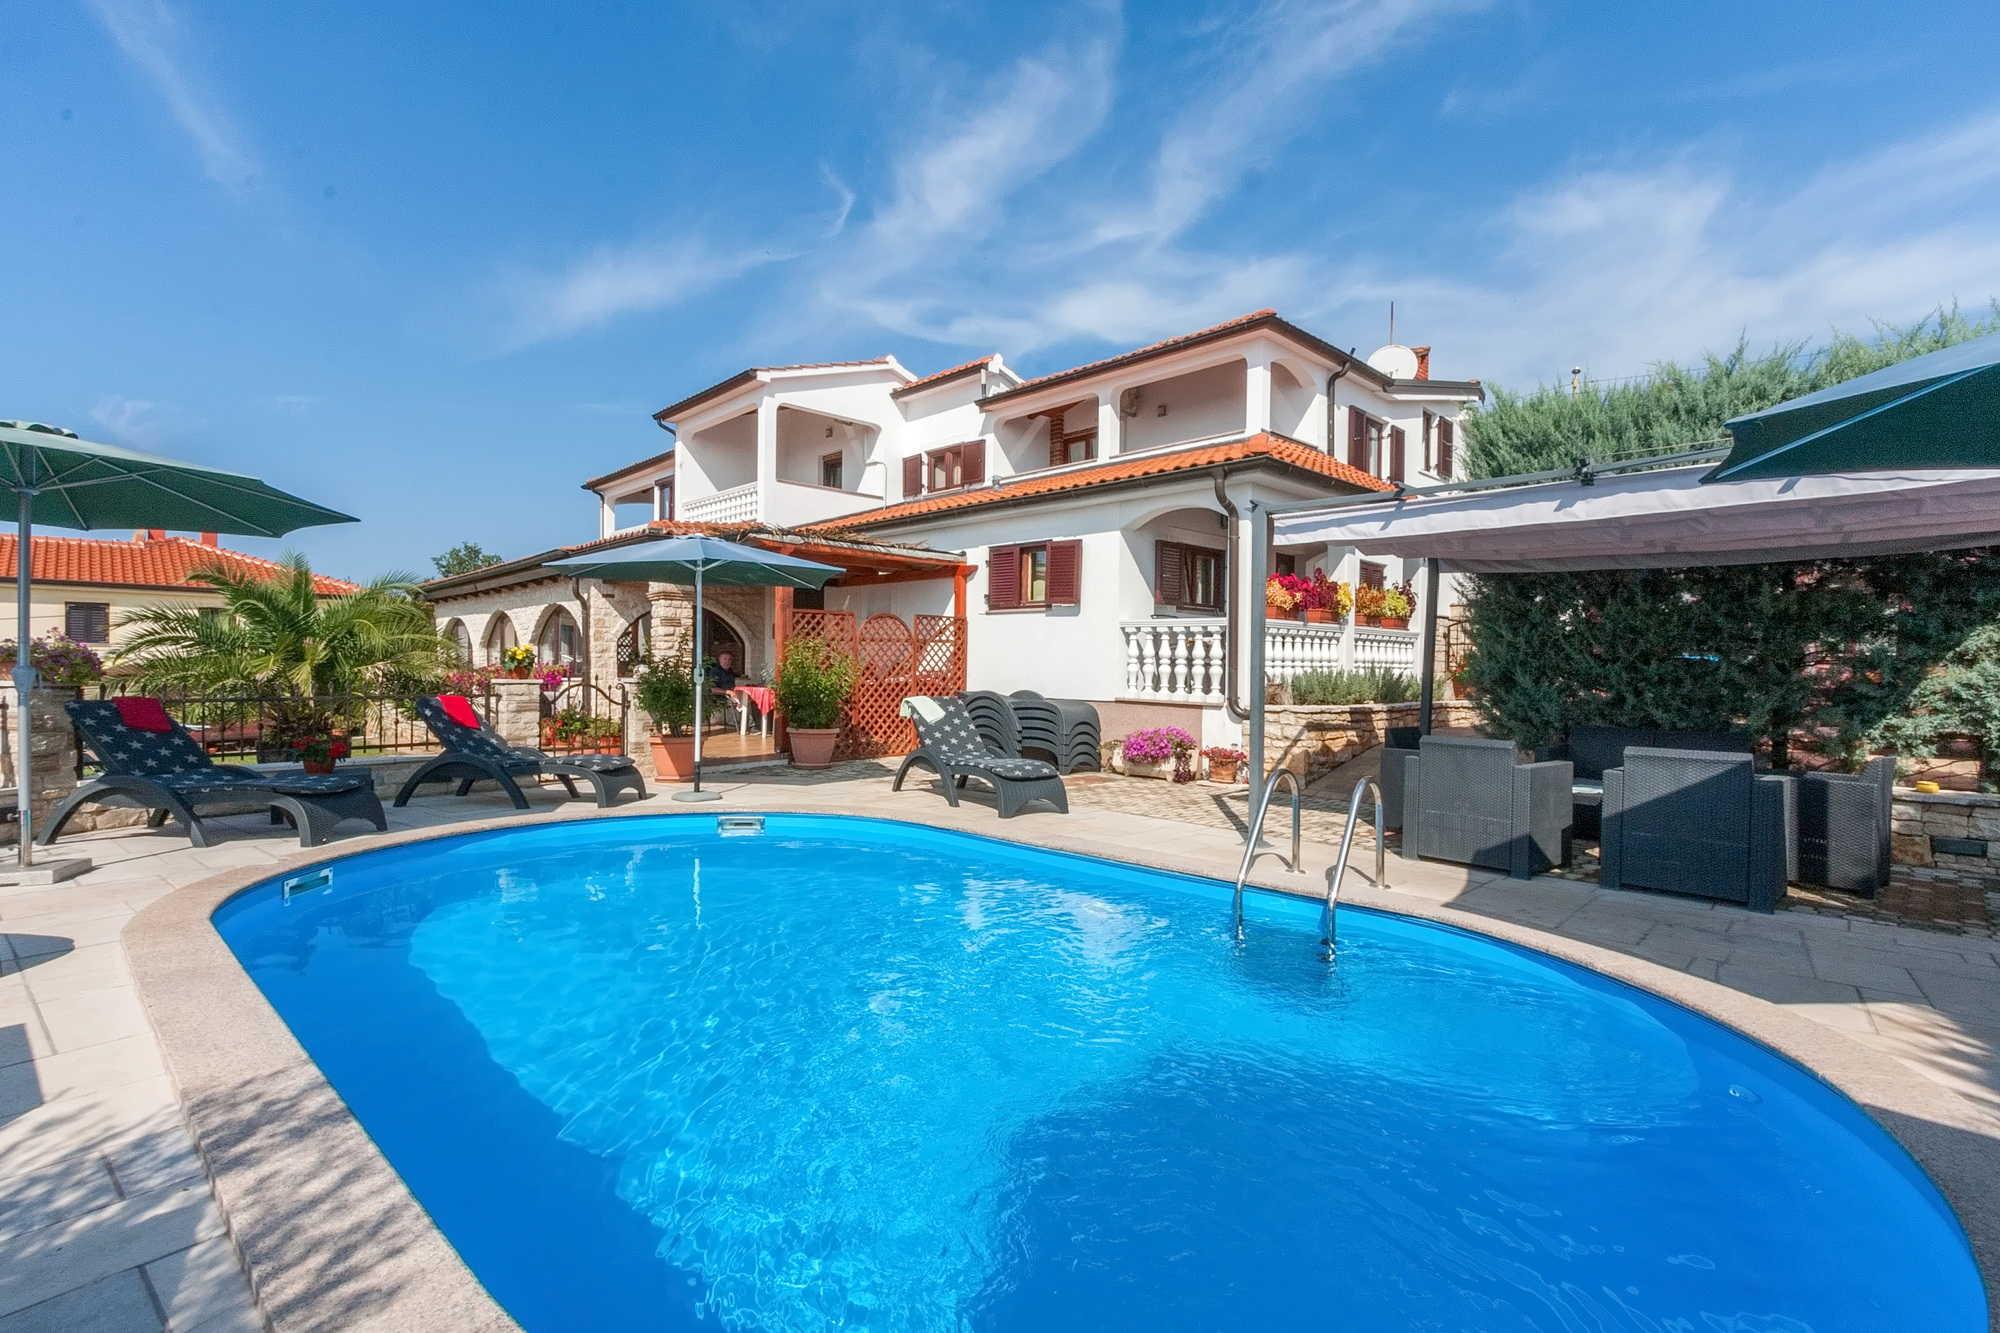 Swimmingpool-Casa Eric in Isrien